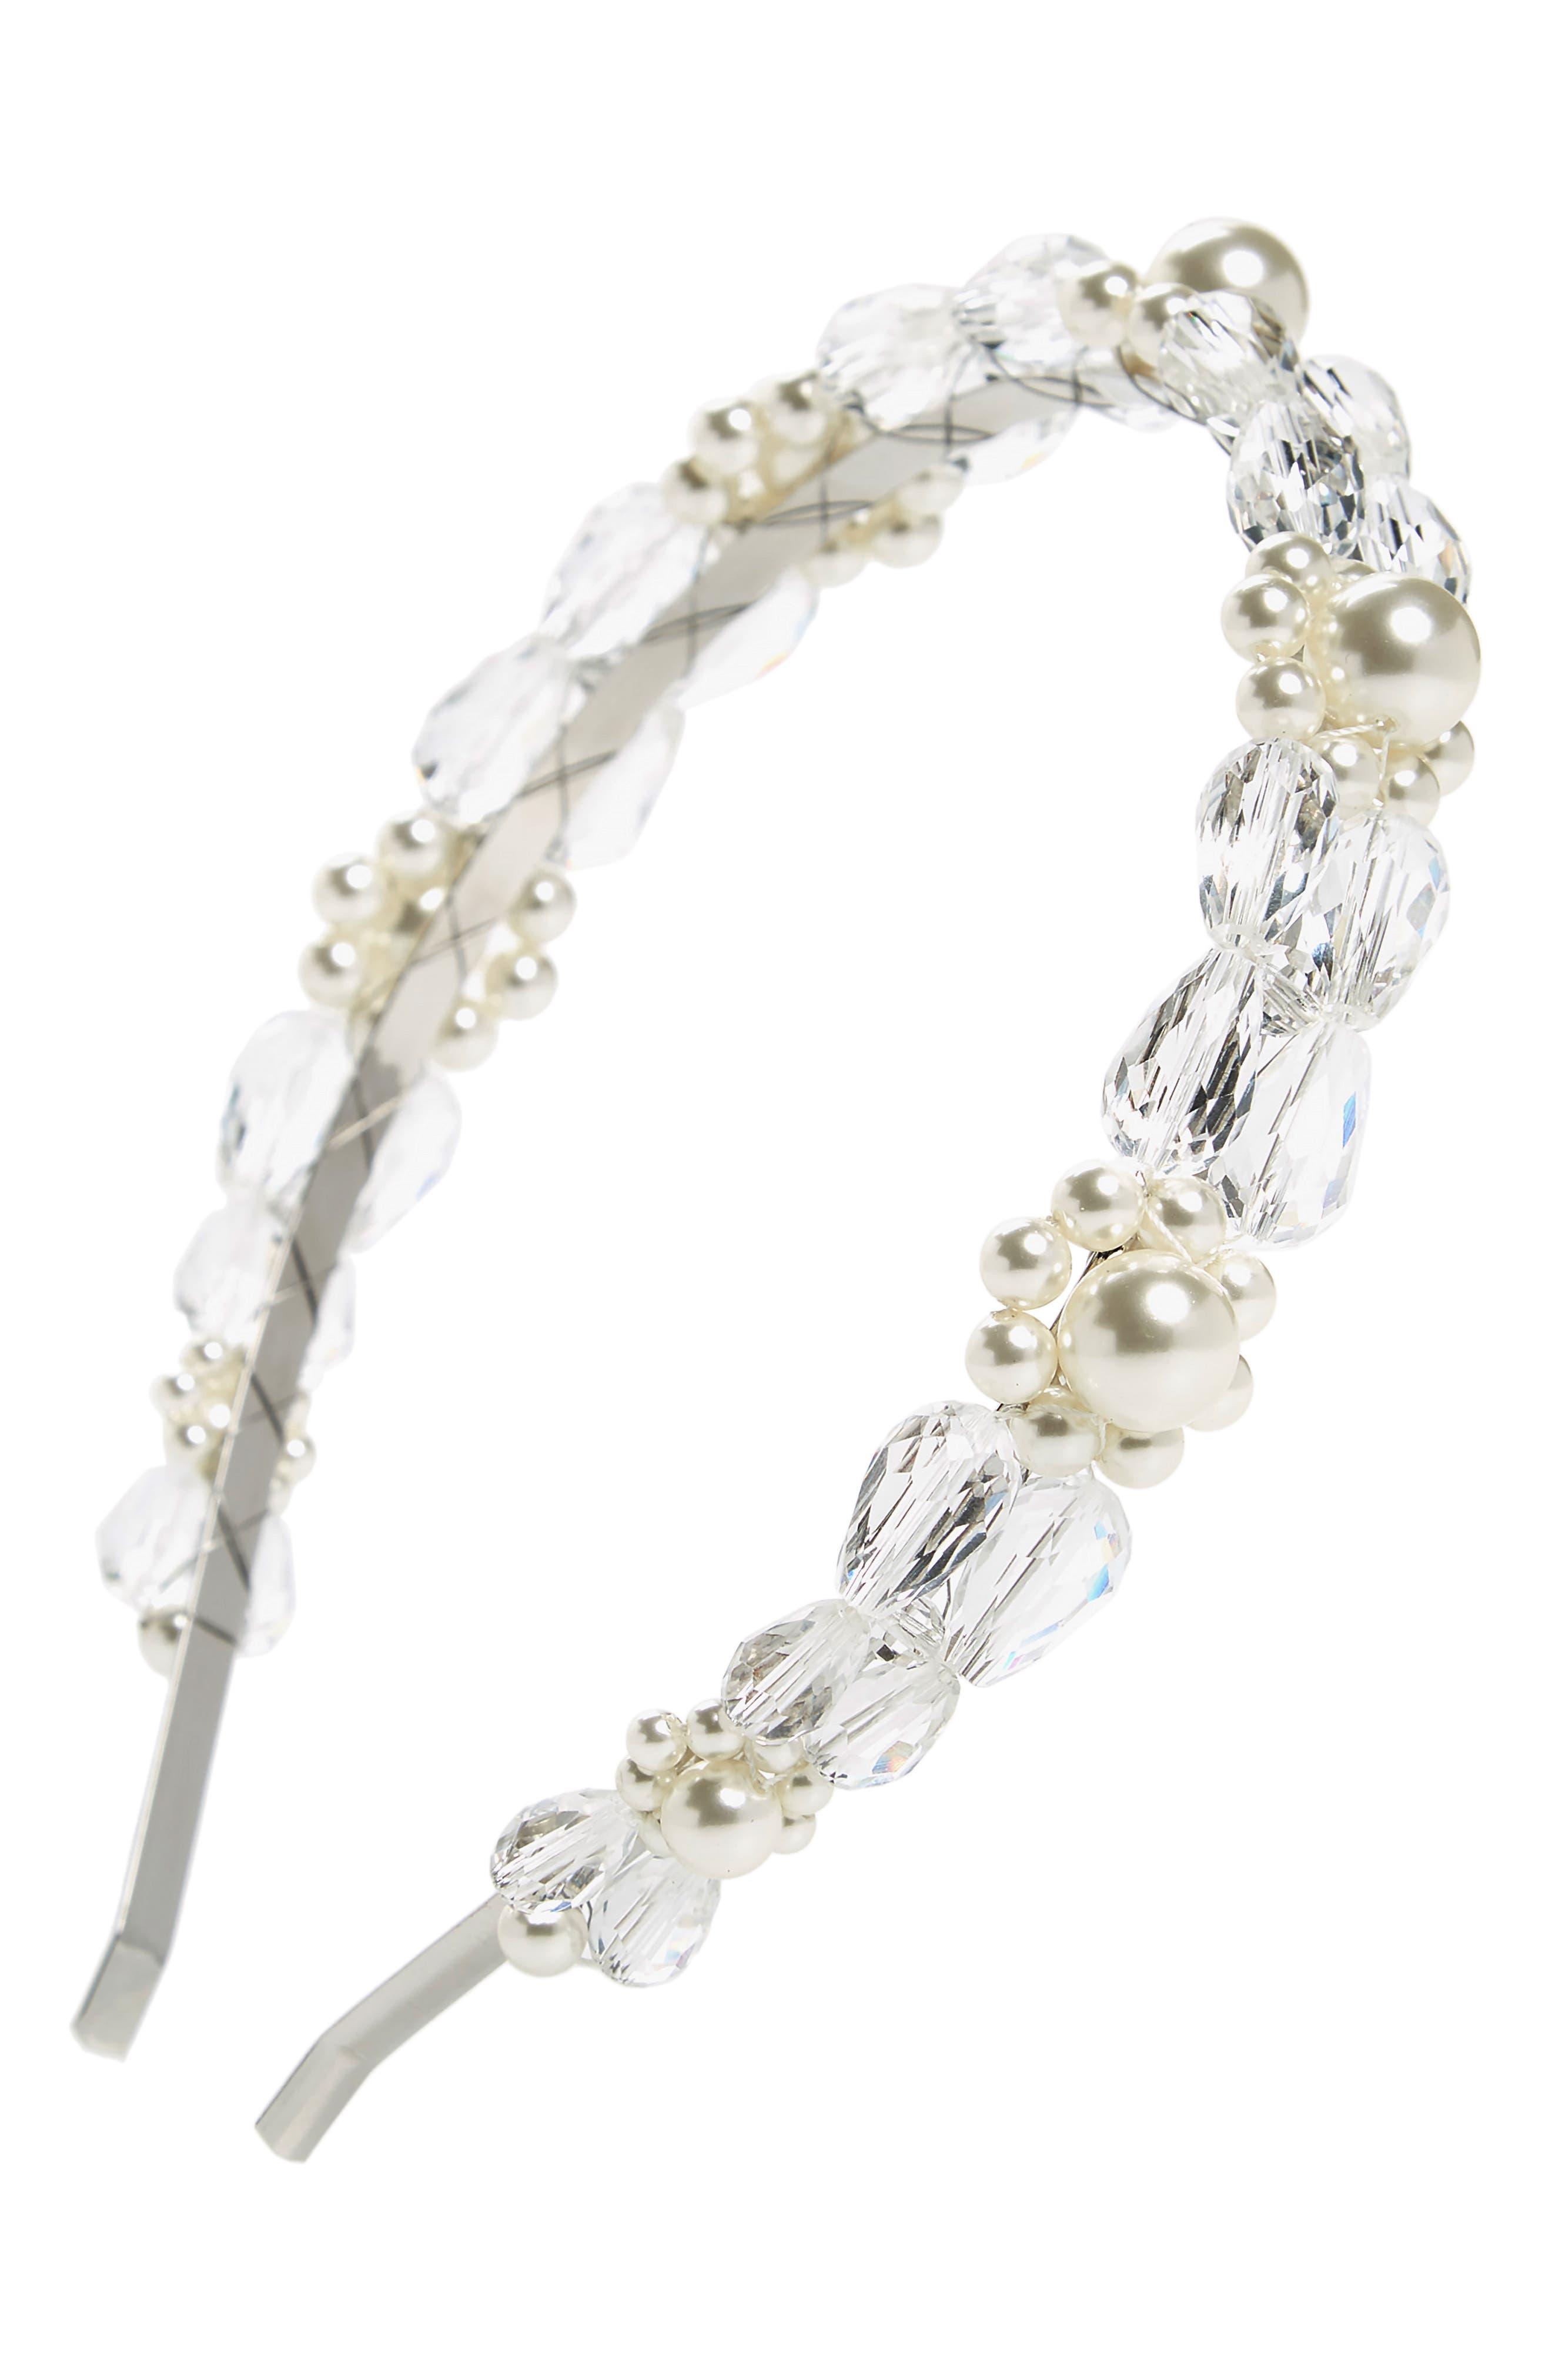 SIMONE ROCHA Daisy Imitation Pearl & Crystal Headband, Main, color, CLEAR/ PEARL